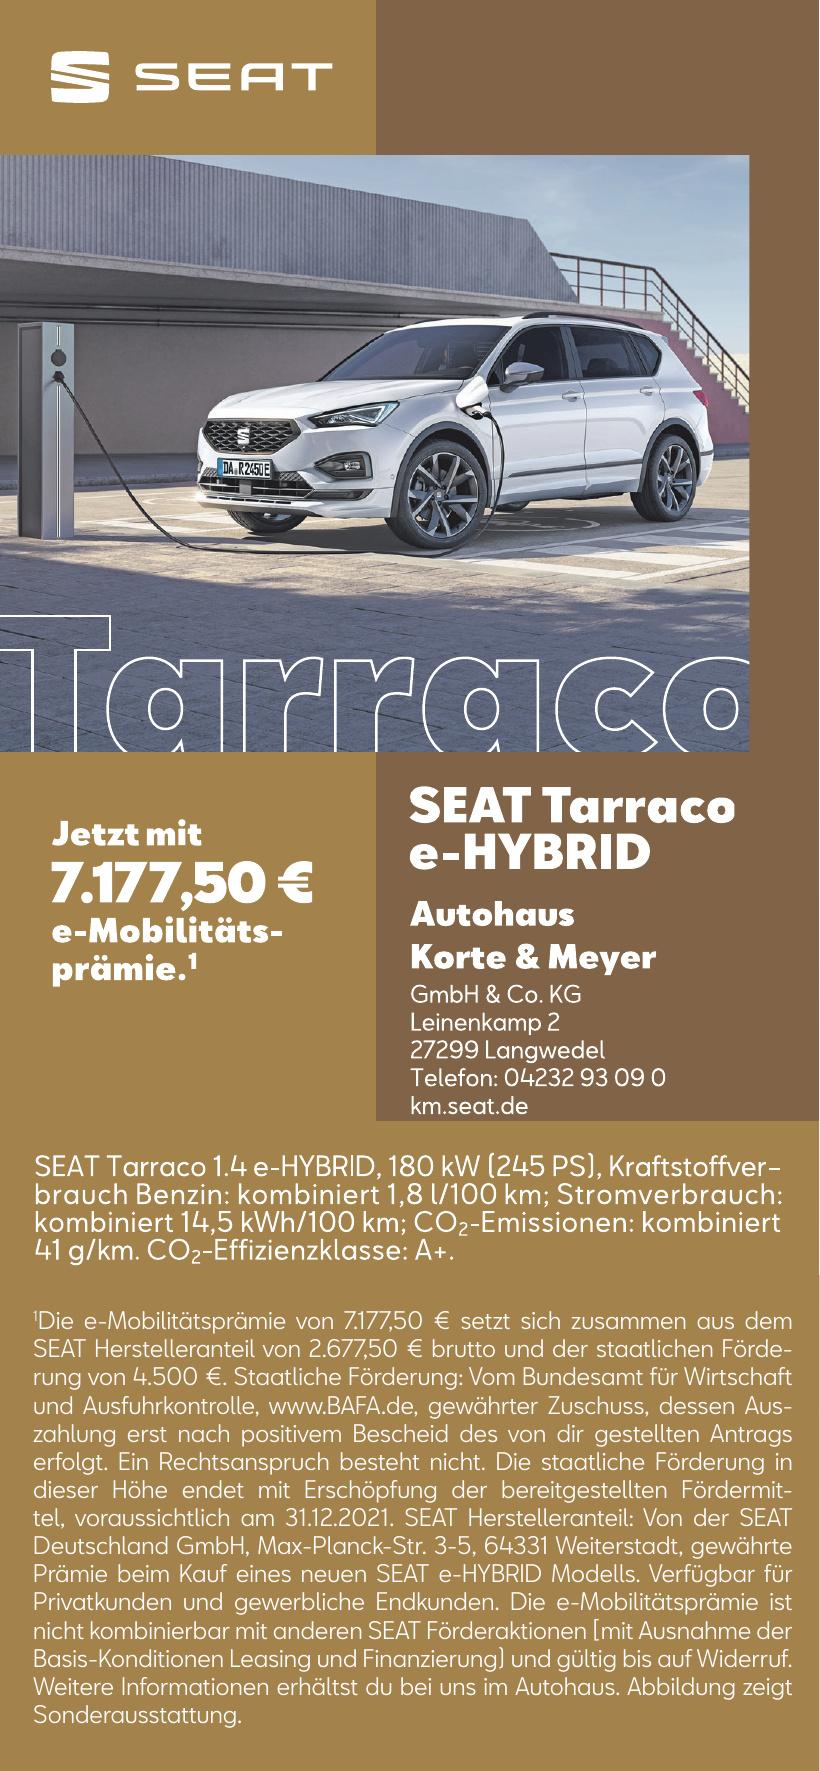 Autohaus Korte & Meyer GmbH & Co. KG